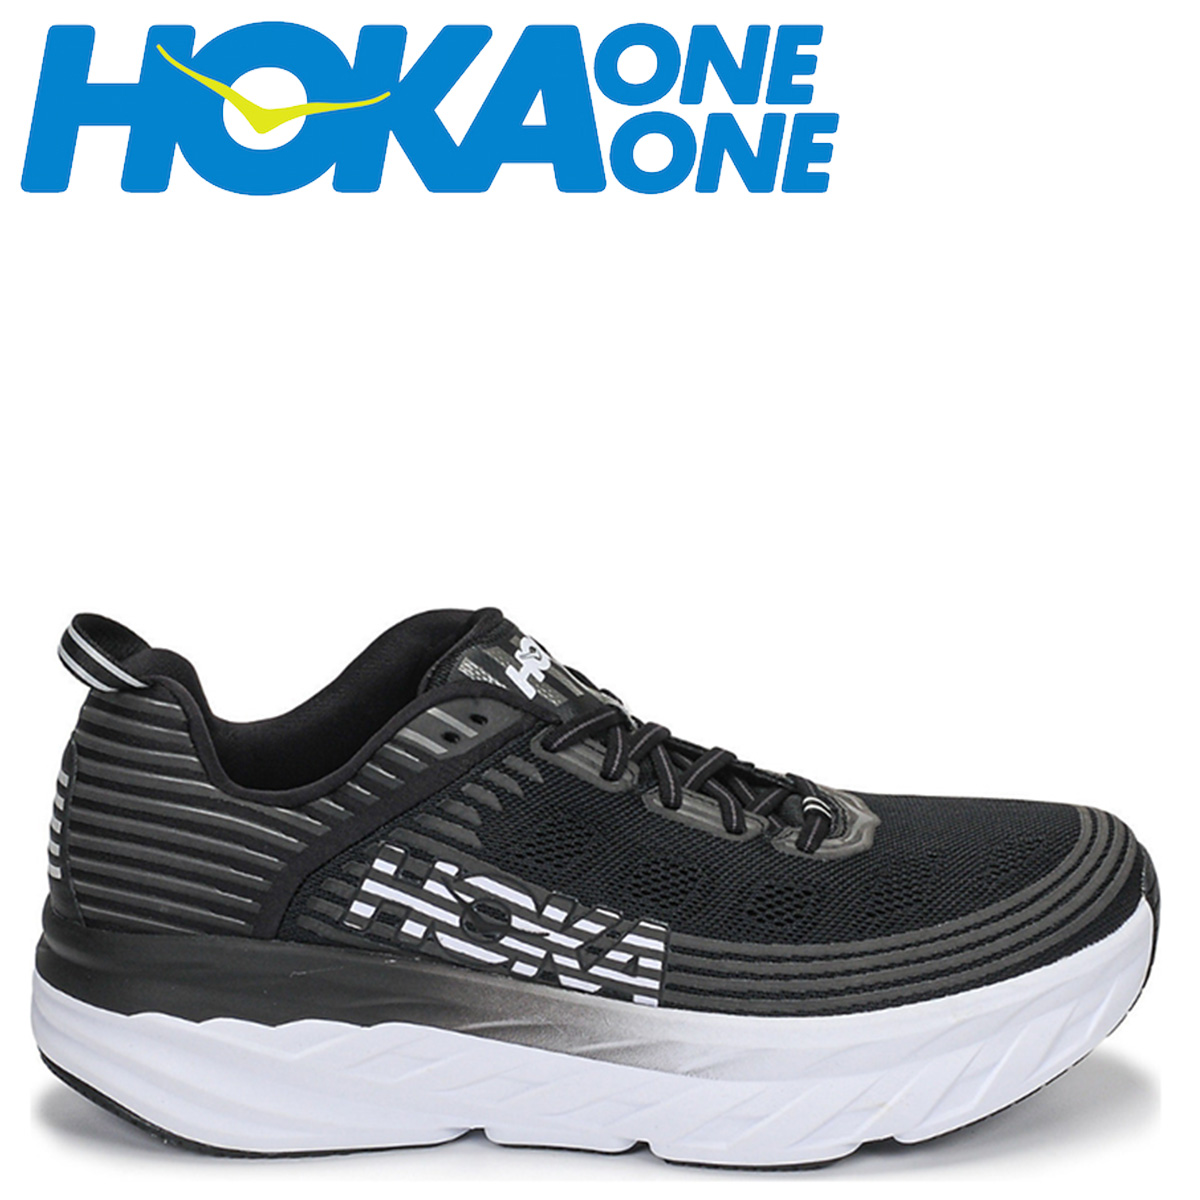 HOKA ONE ONE ホカオネオネ ボンダイ6 スニーカー メンズ BONDI 6 ブラック 黒 1019269